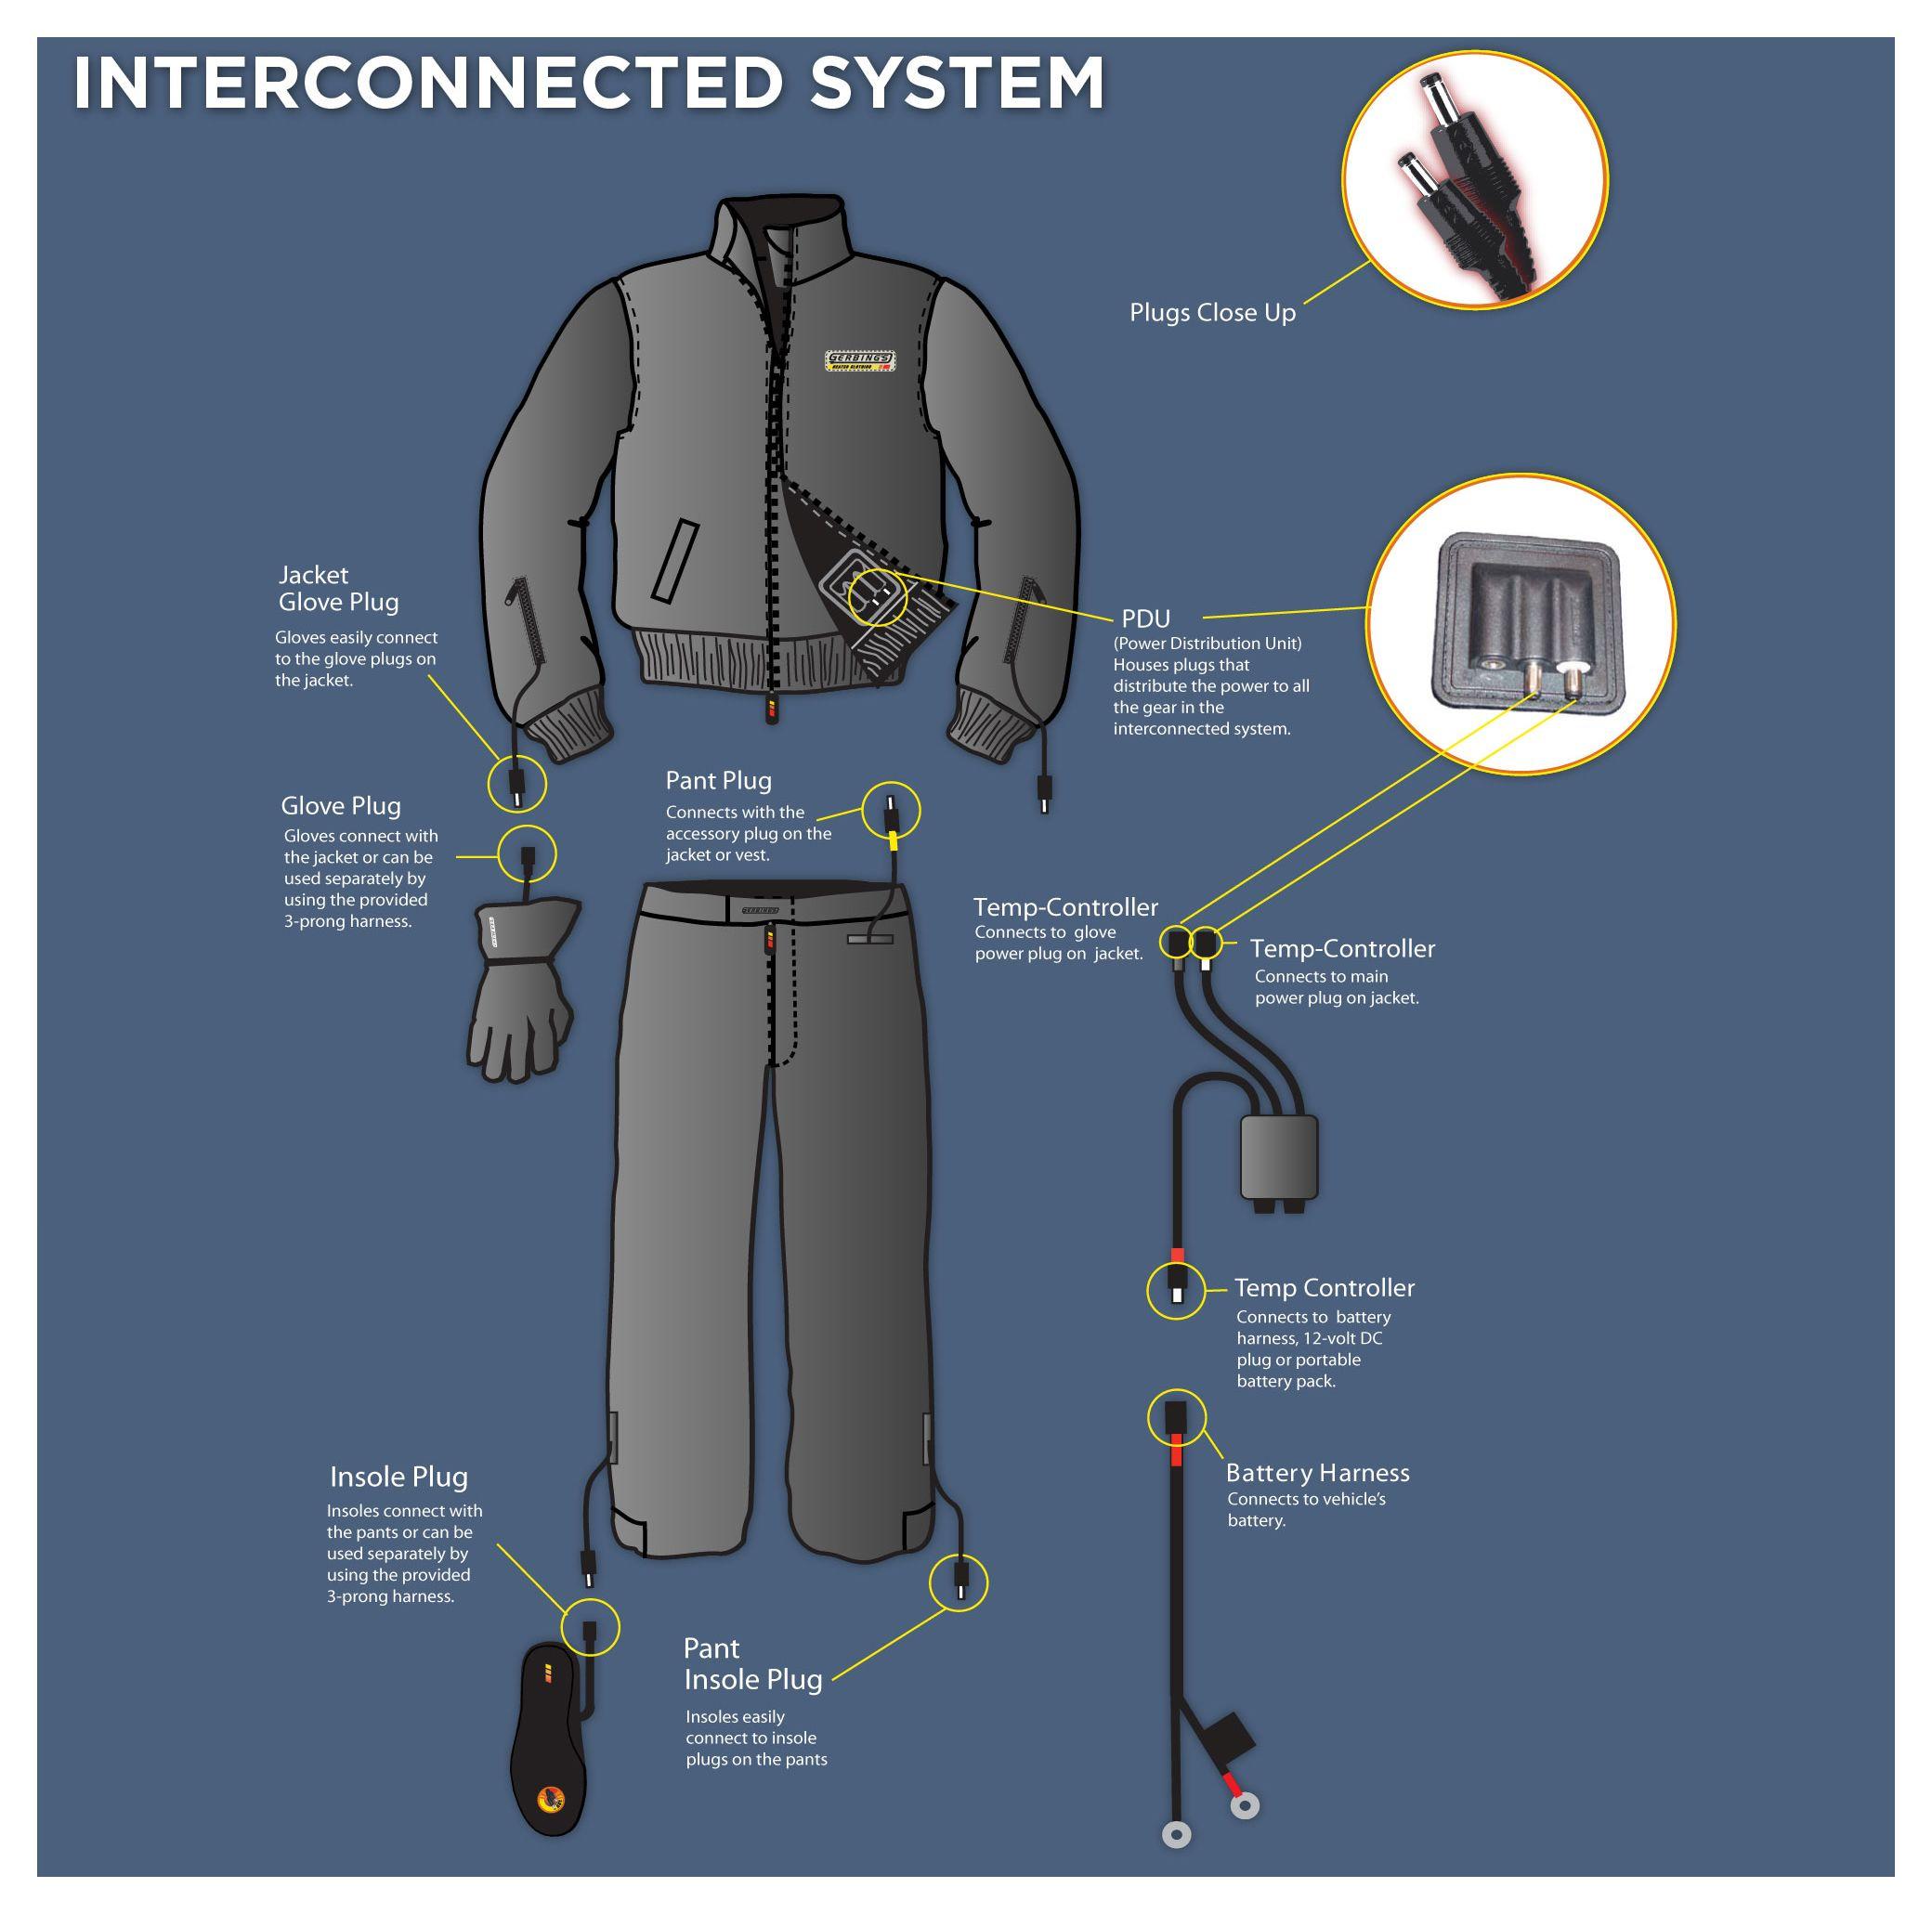 gerbing wiring instructions find wiring diagram u2022 rh empcom co Universal Ignition Switch Wiring Diagram Wire Money